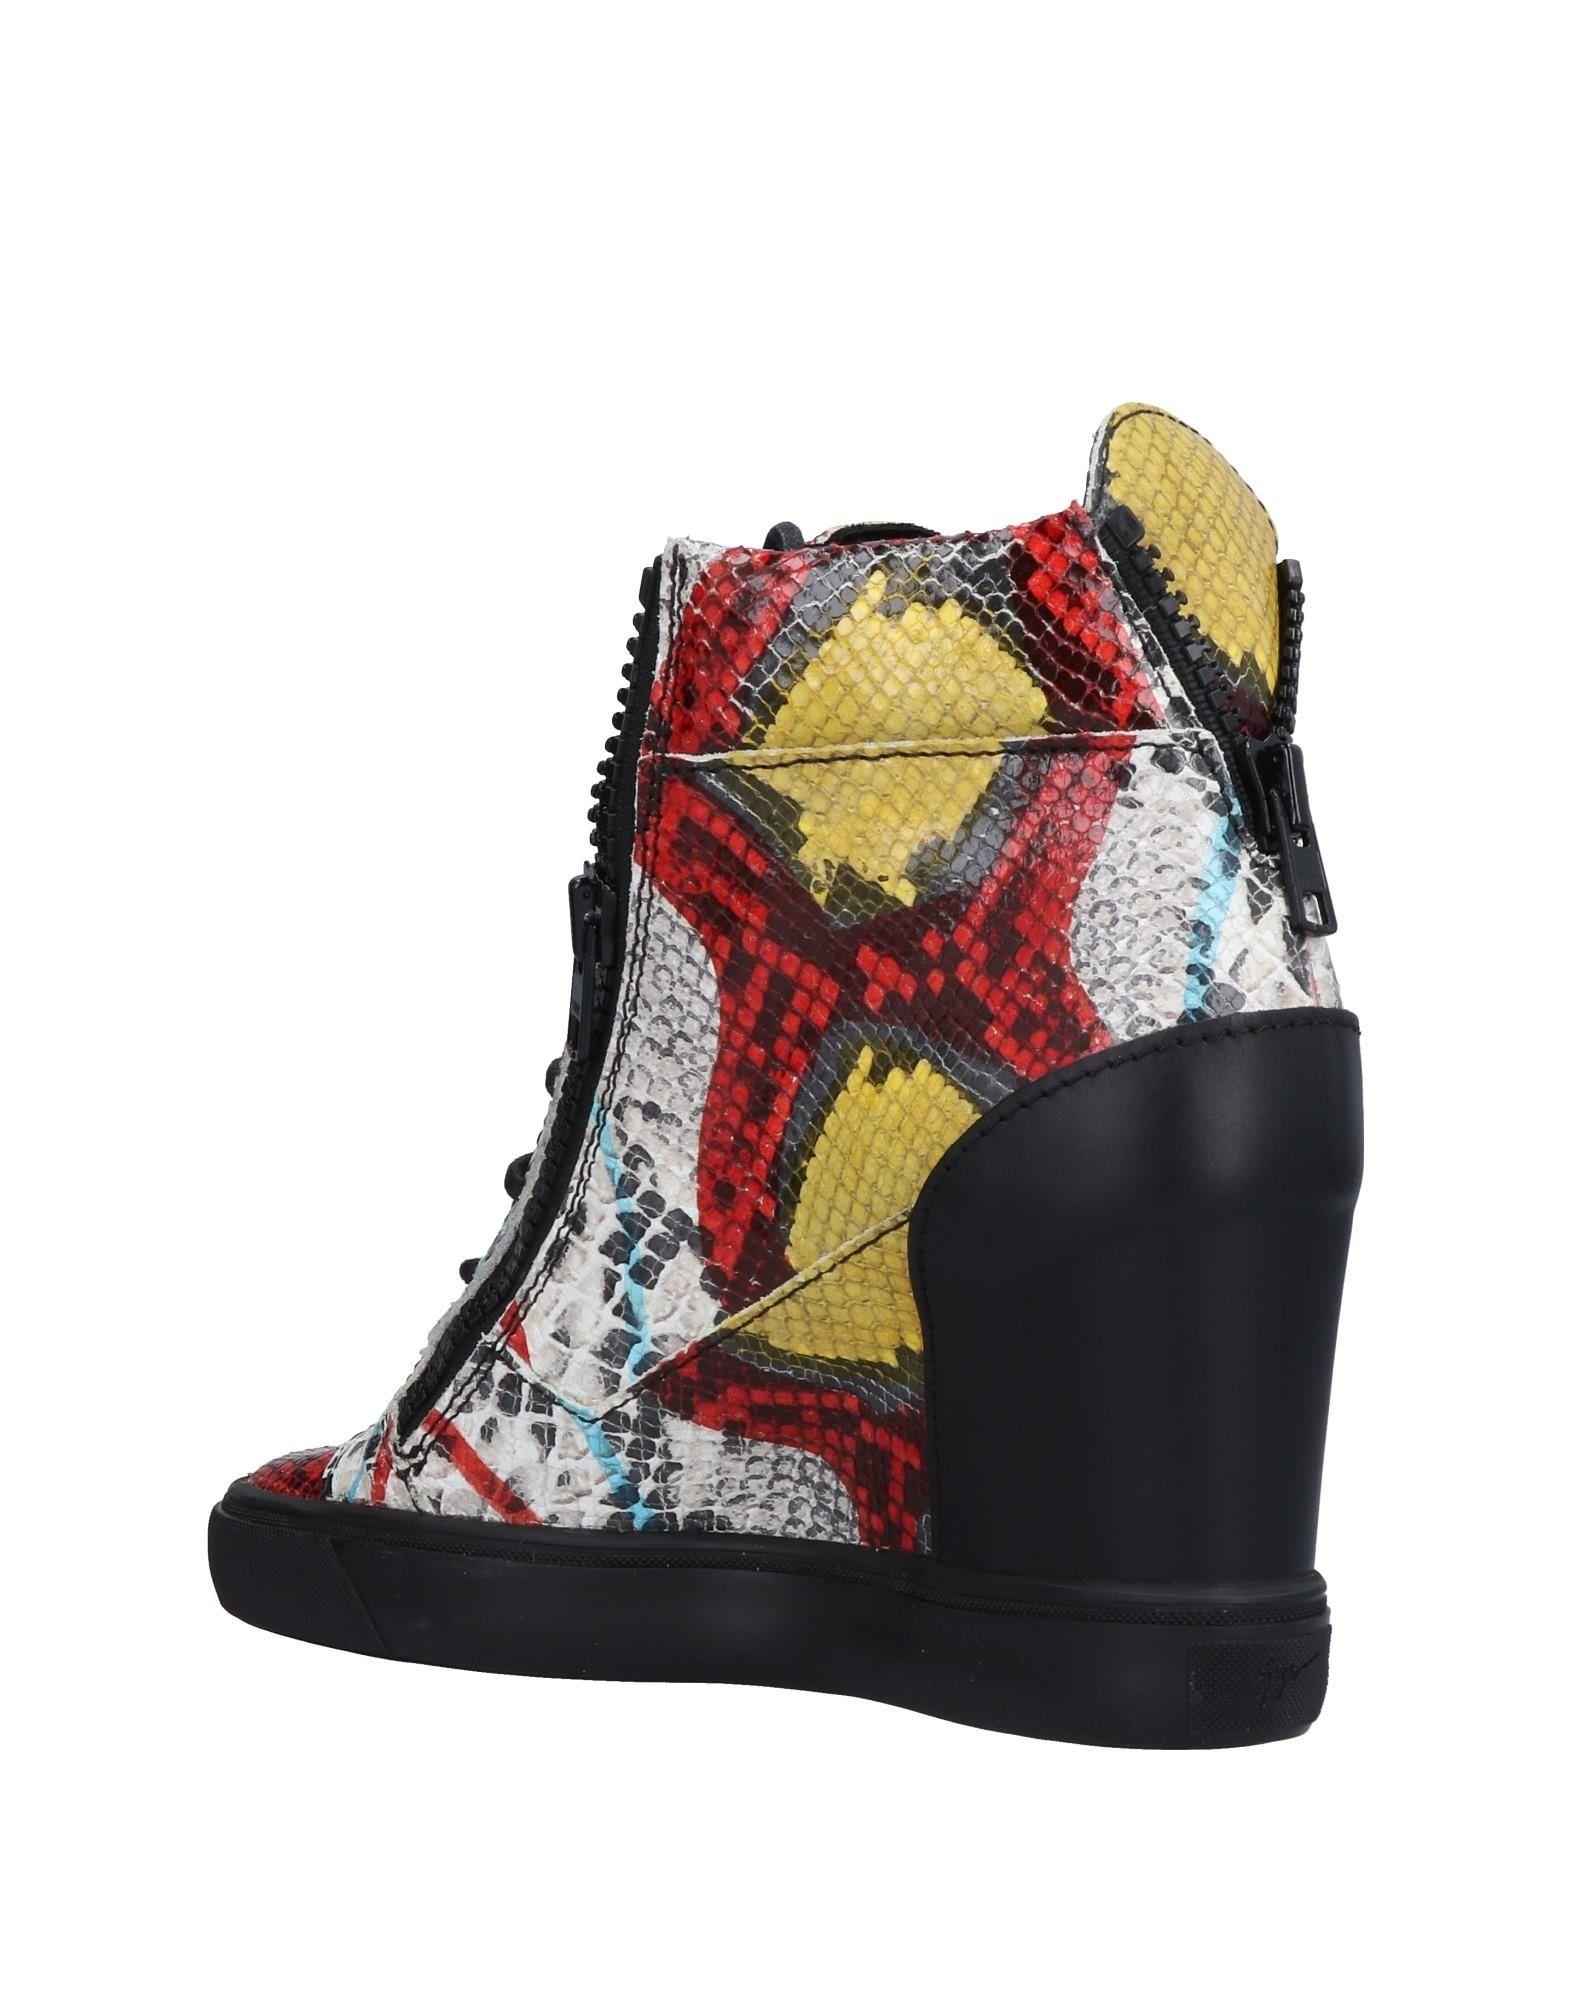 Giuseppe Zanotti Sneakers Damen aussehende  11504061TIGünstige gut aussehende Damen Schuhe 6365e3